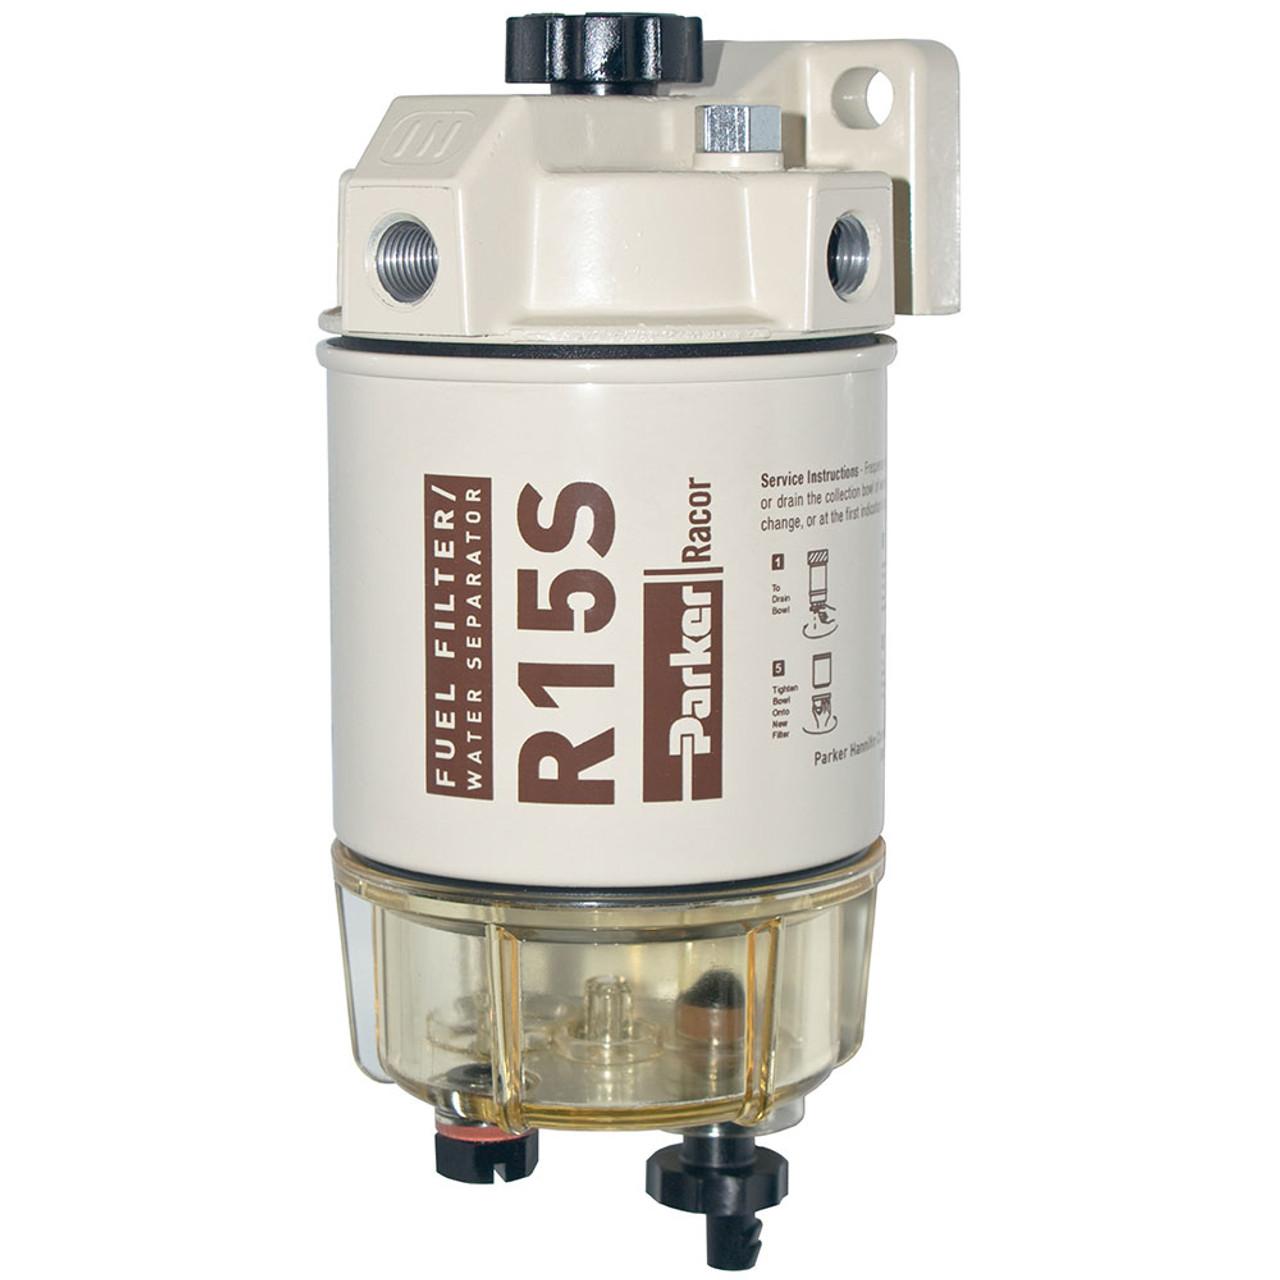 racor 200 series 15 gph low flow diesel fuel filter water separator 215 filter assembly [ 1280 x 1280 Pixel ]